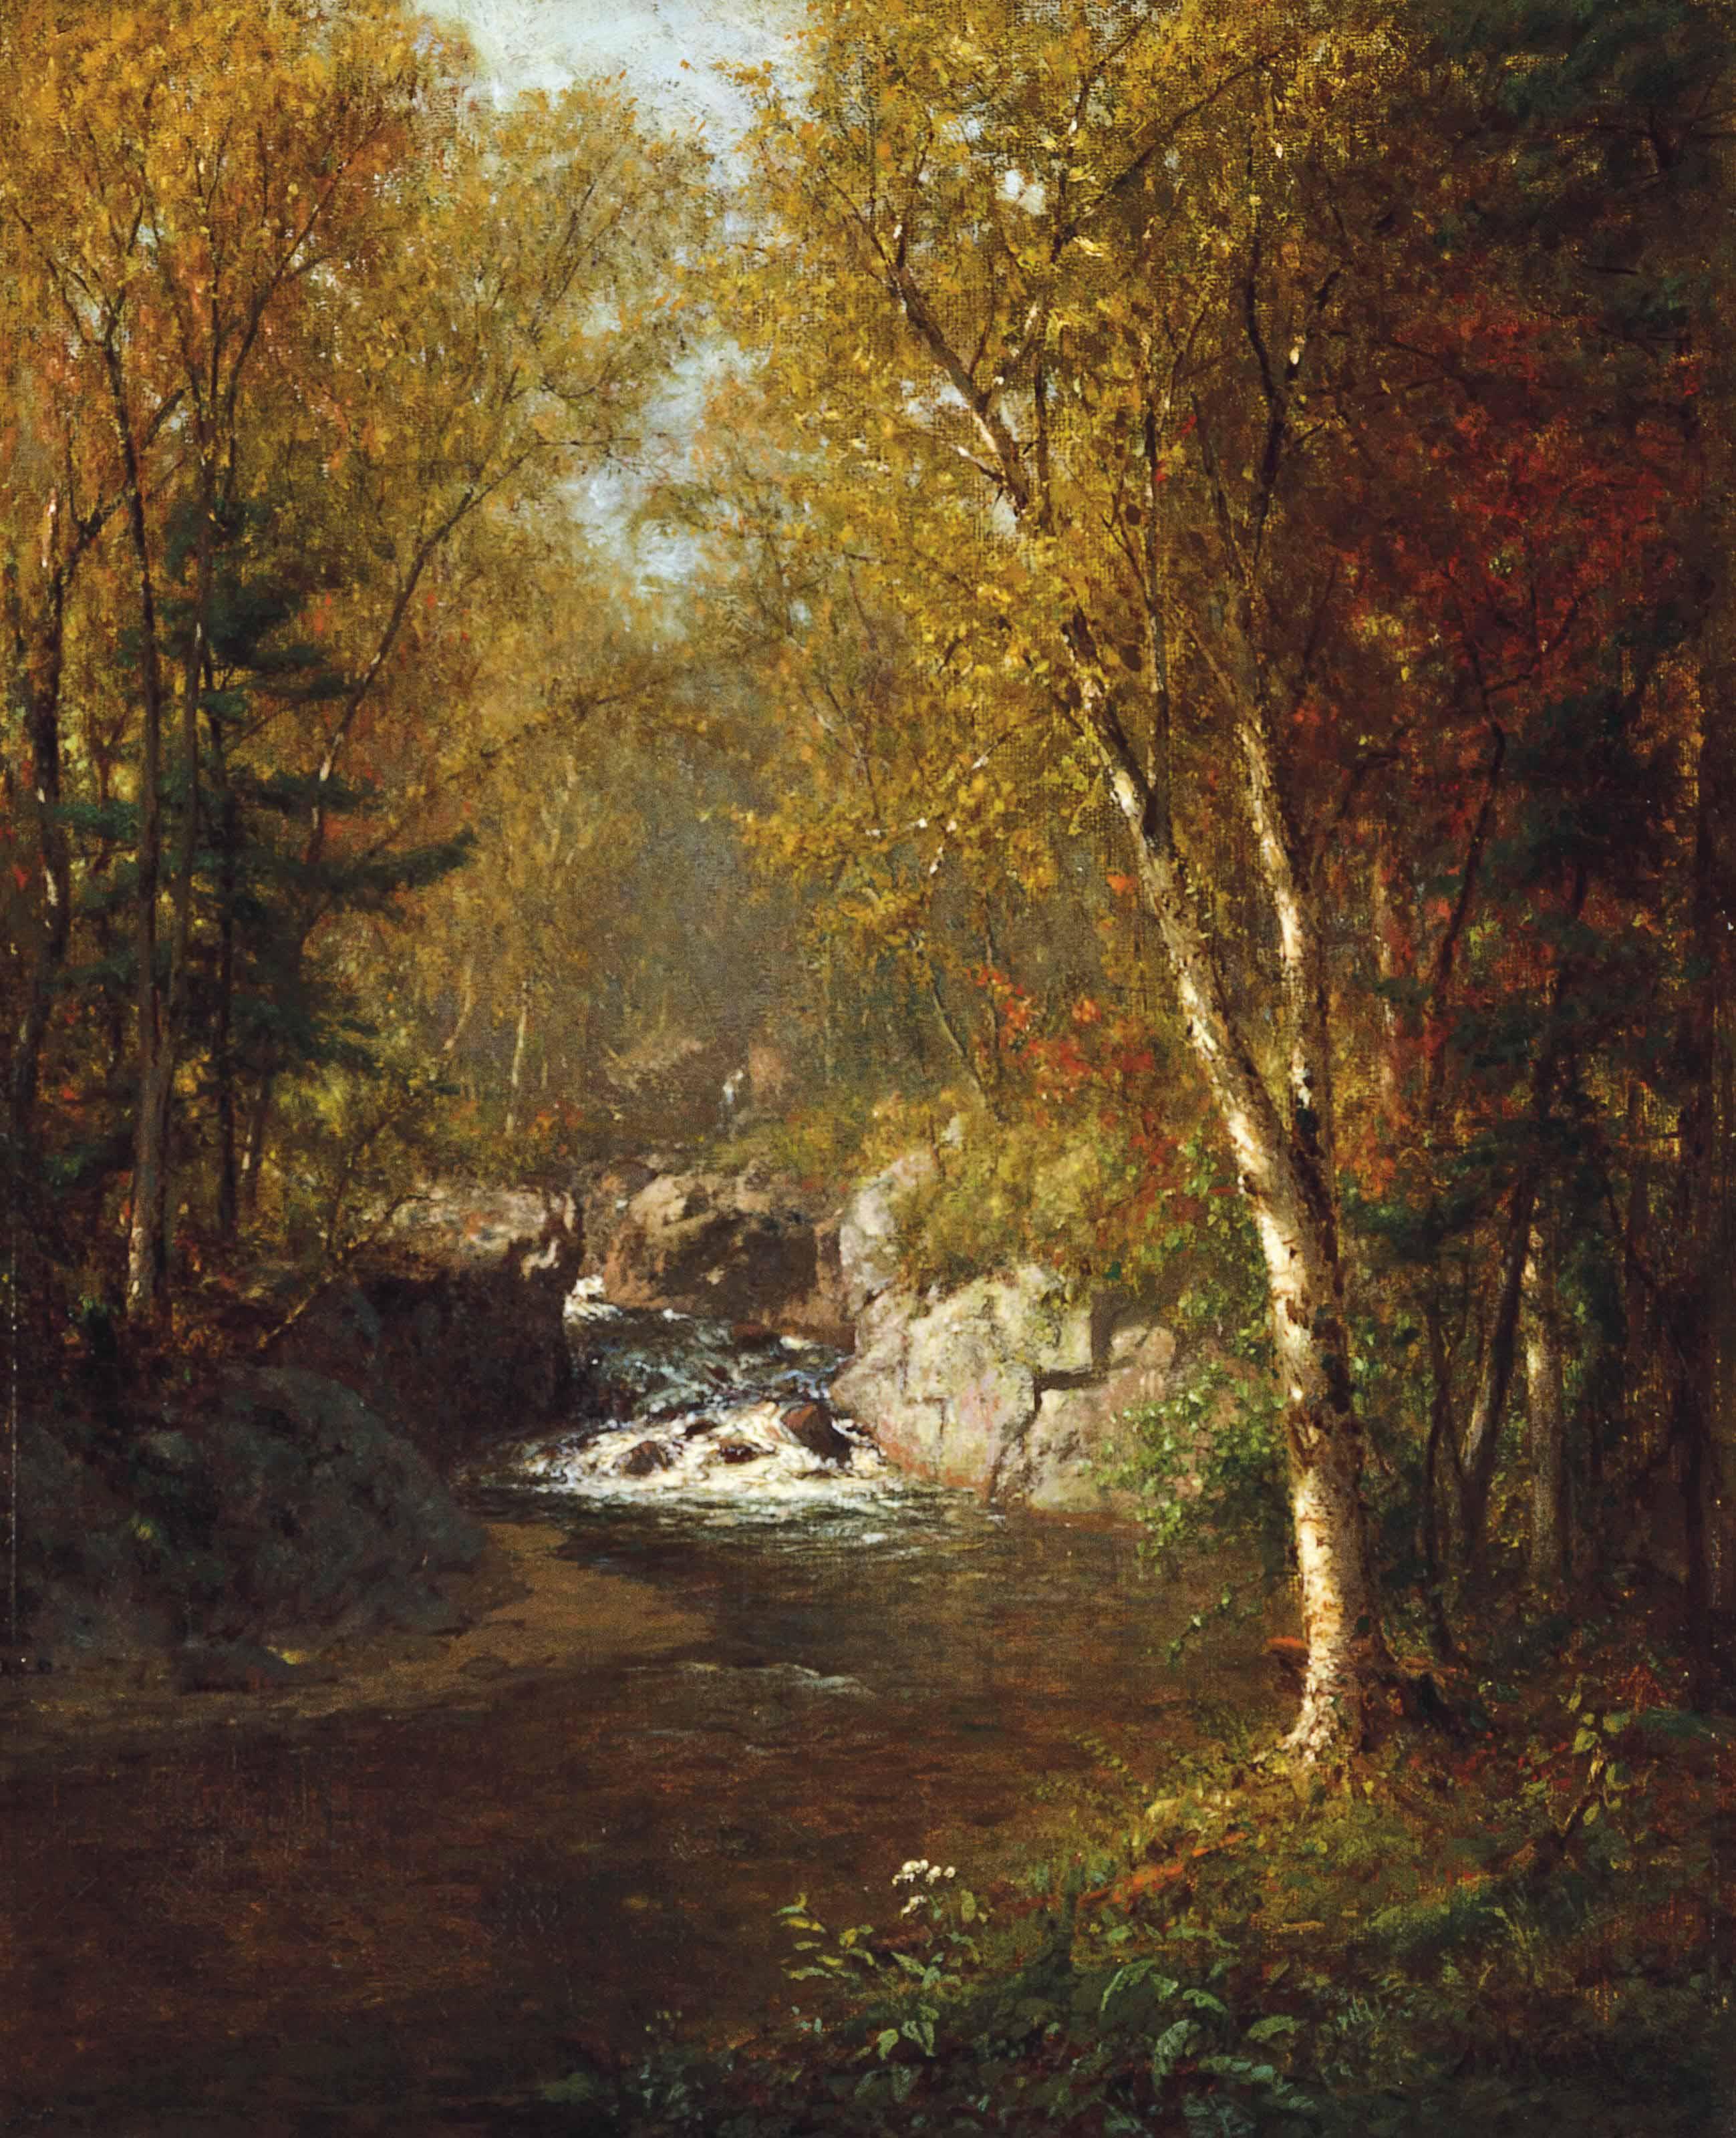 John's Brook, Keene Valley, Adirondack Mountains